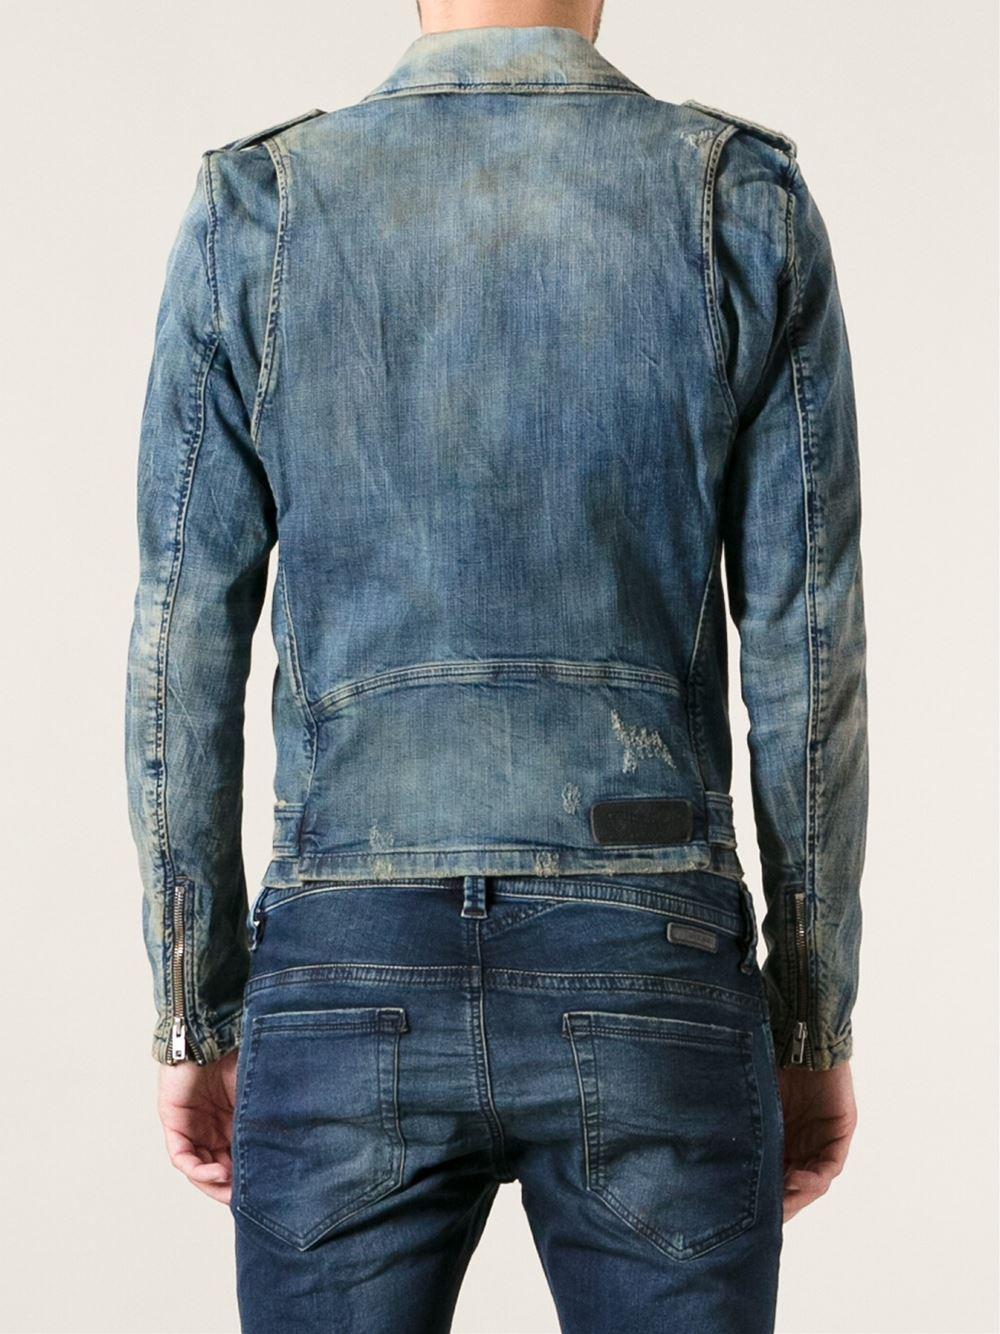 Distressed Jeans Men